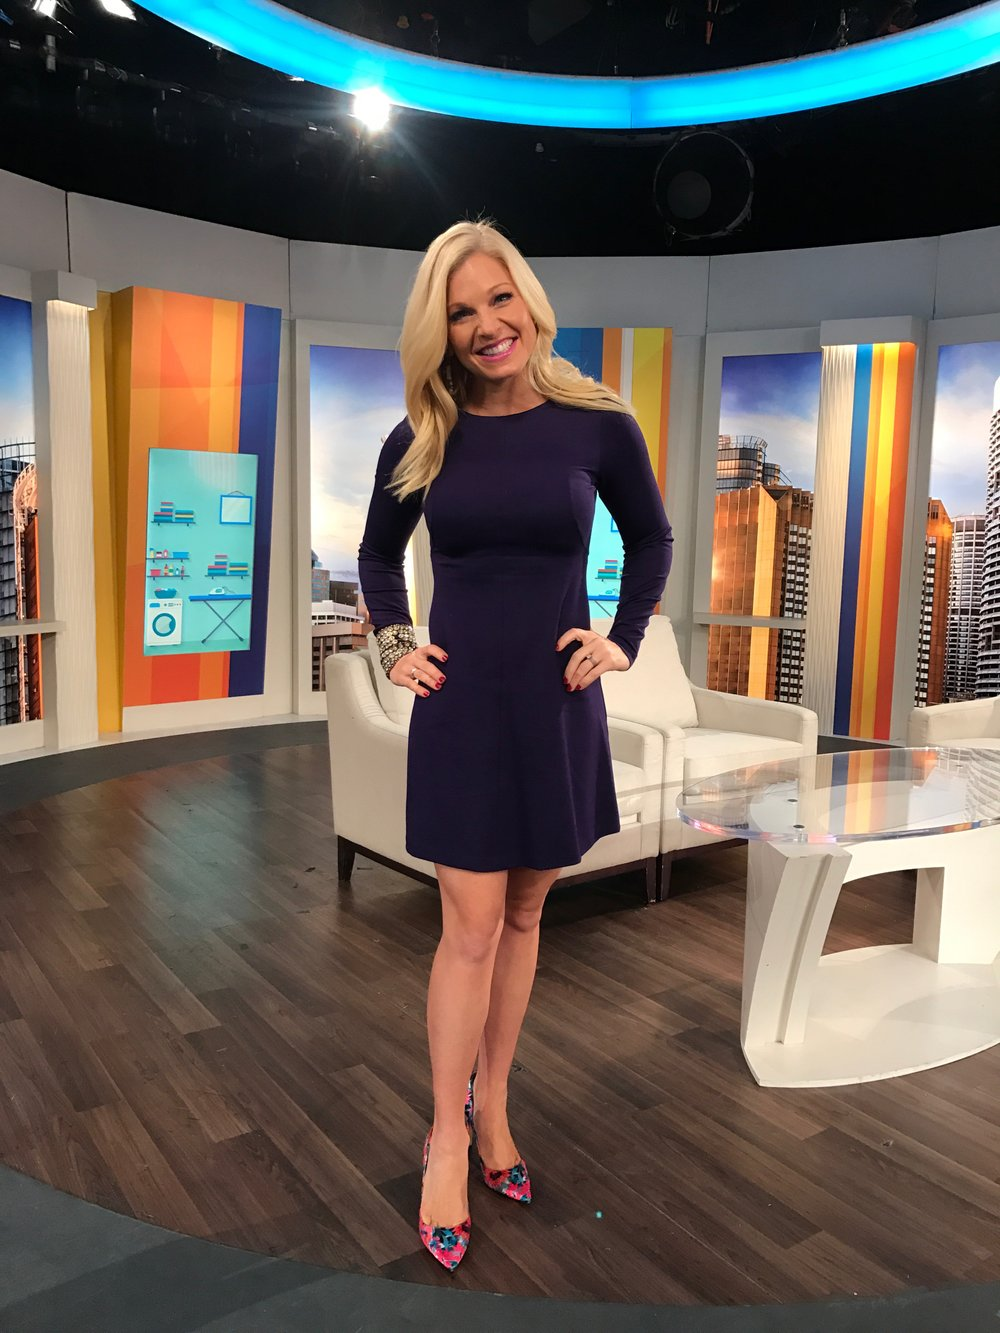 Anna Kooiman Australia The Today Show 2017 AnnaKooiman.com fitness travel lifestyle